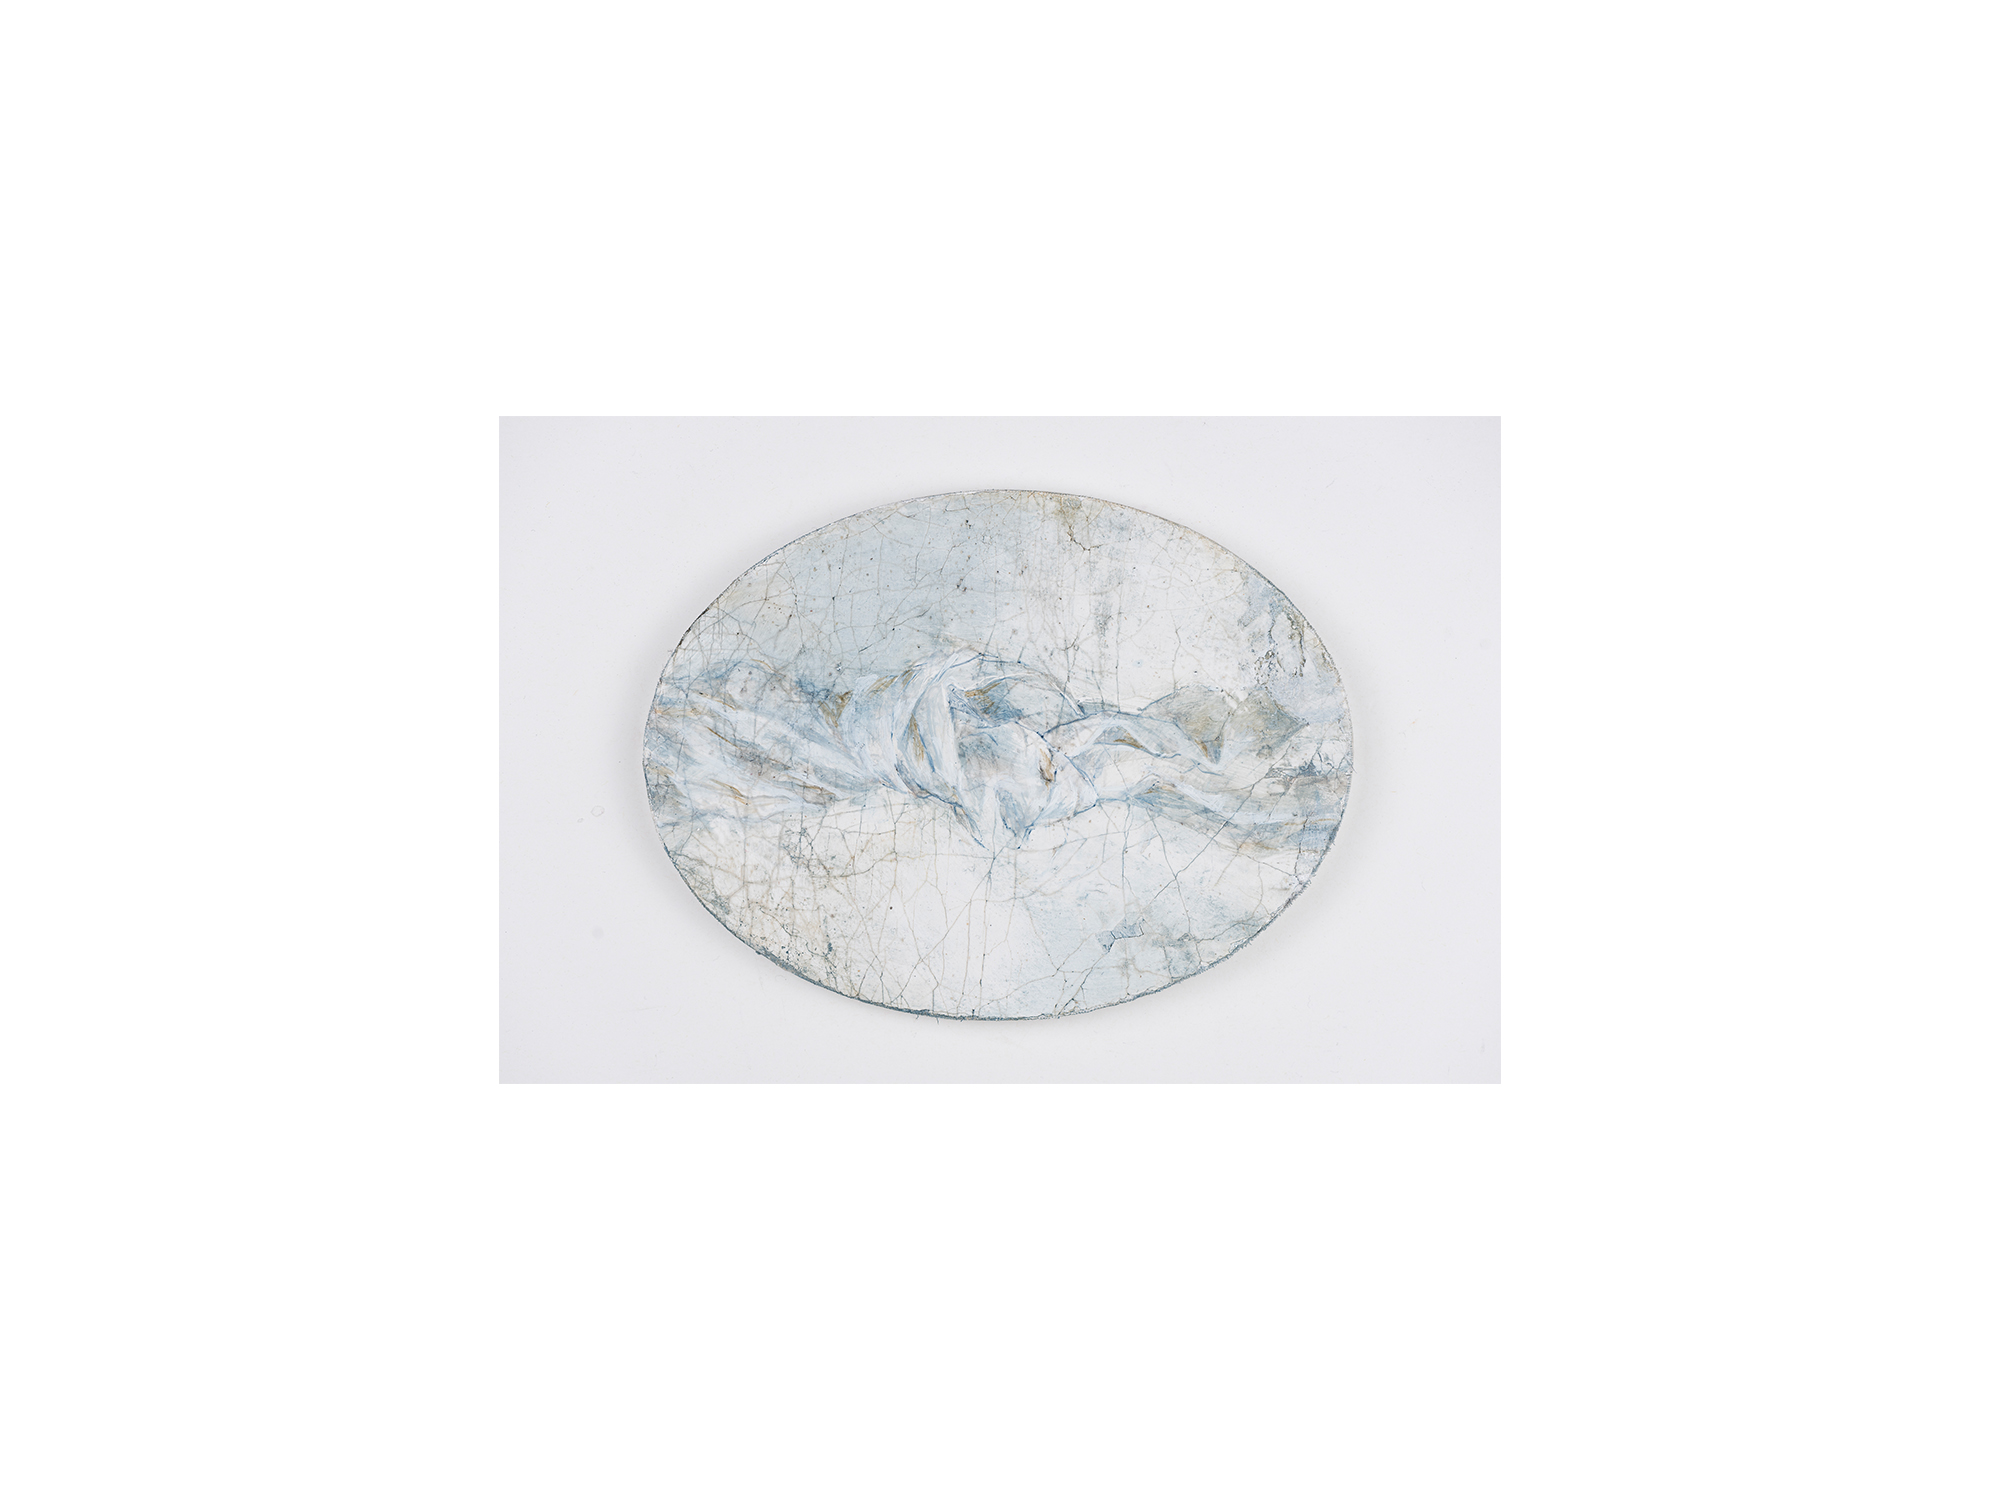 Sarah Tomasetti   Cloud Knot II , 2018 oil and encaustic on fresco plaster 16 x 21cm